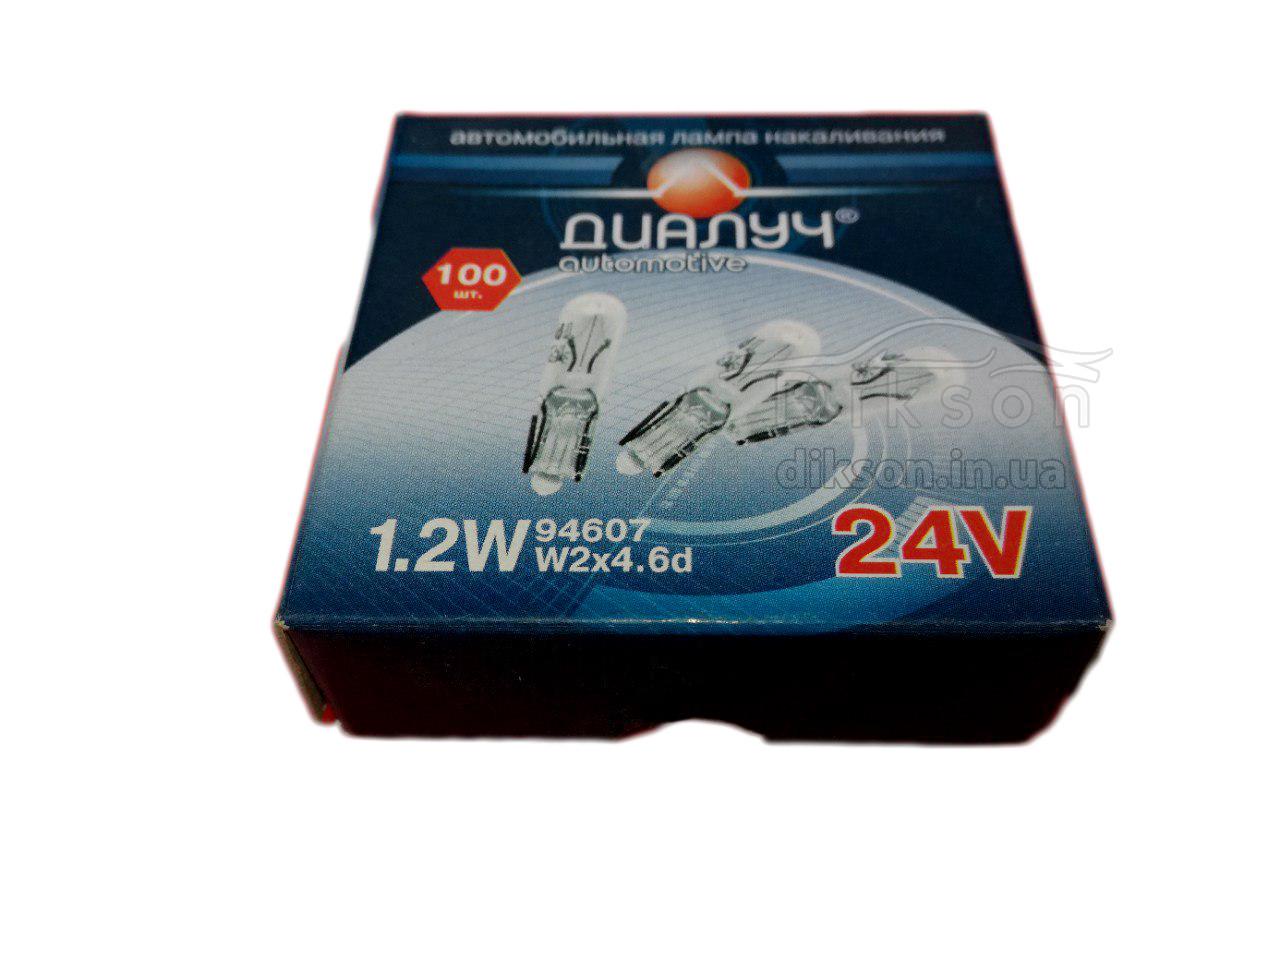 Лампочка Диалуч 12V 1,2 W W2x4,6D